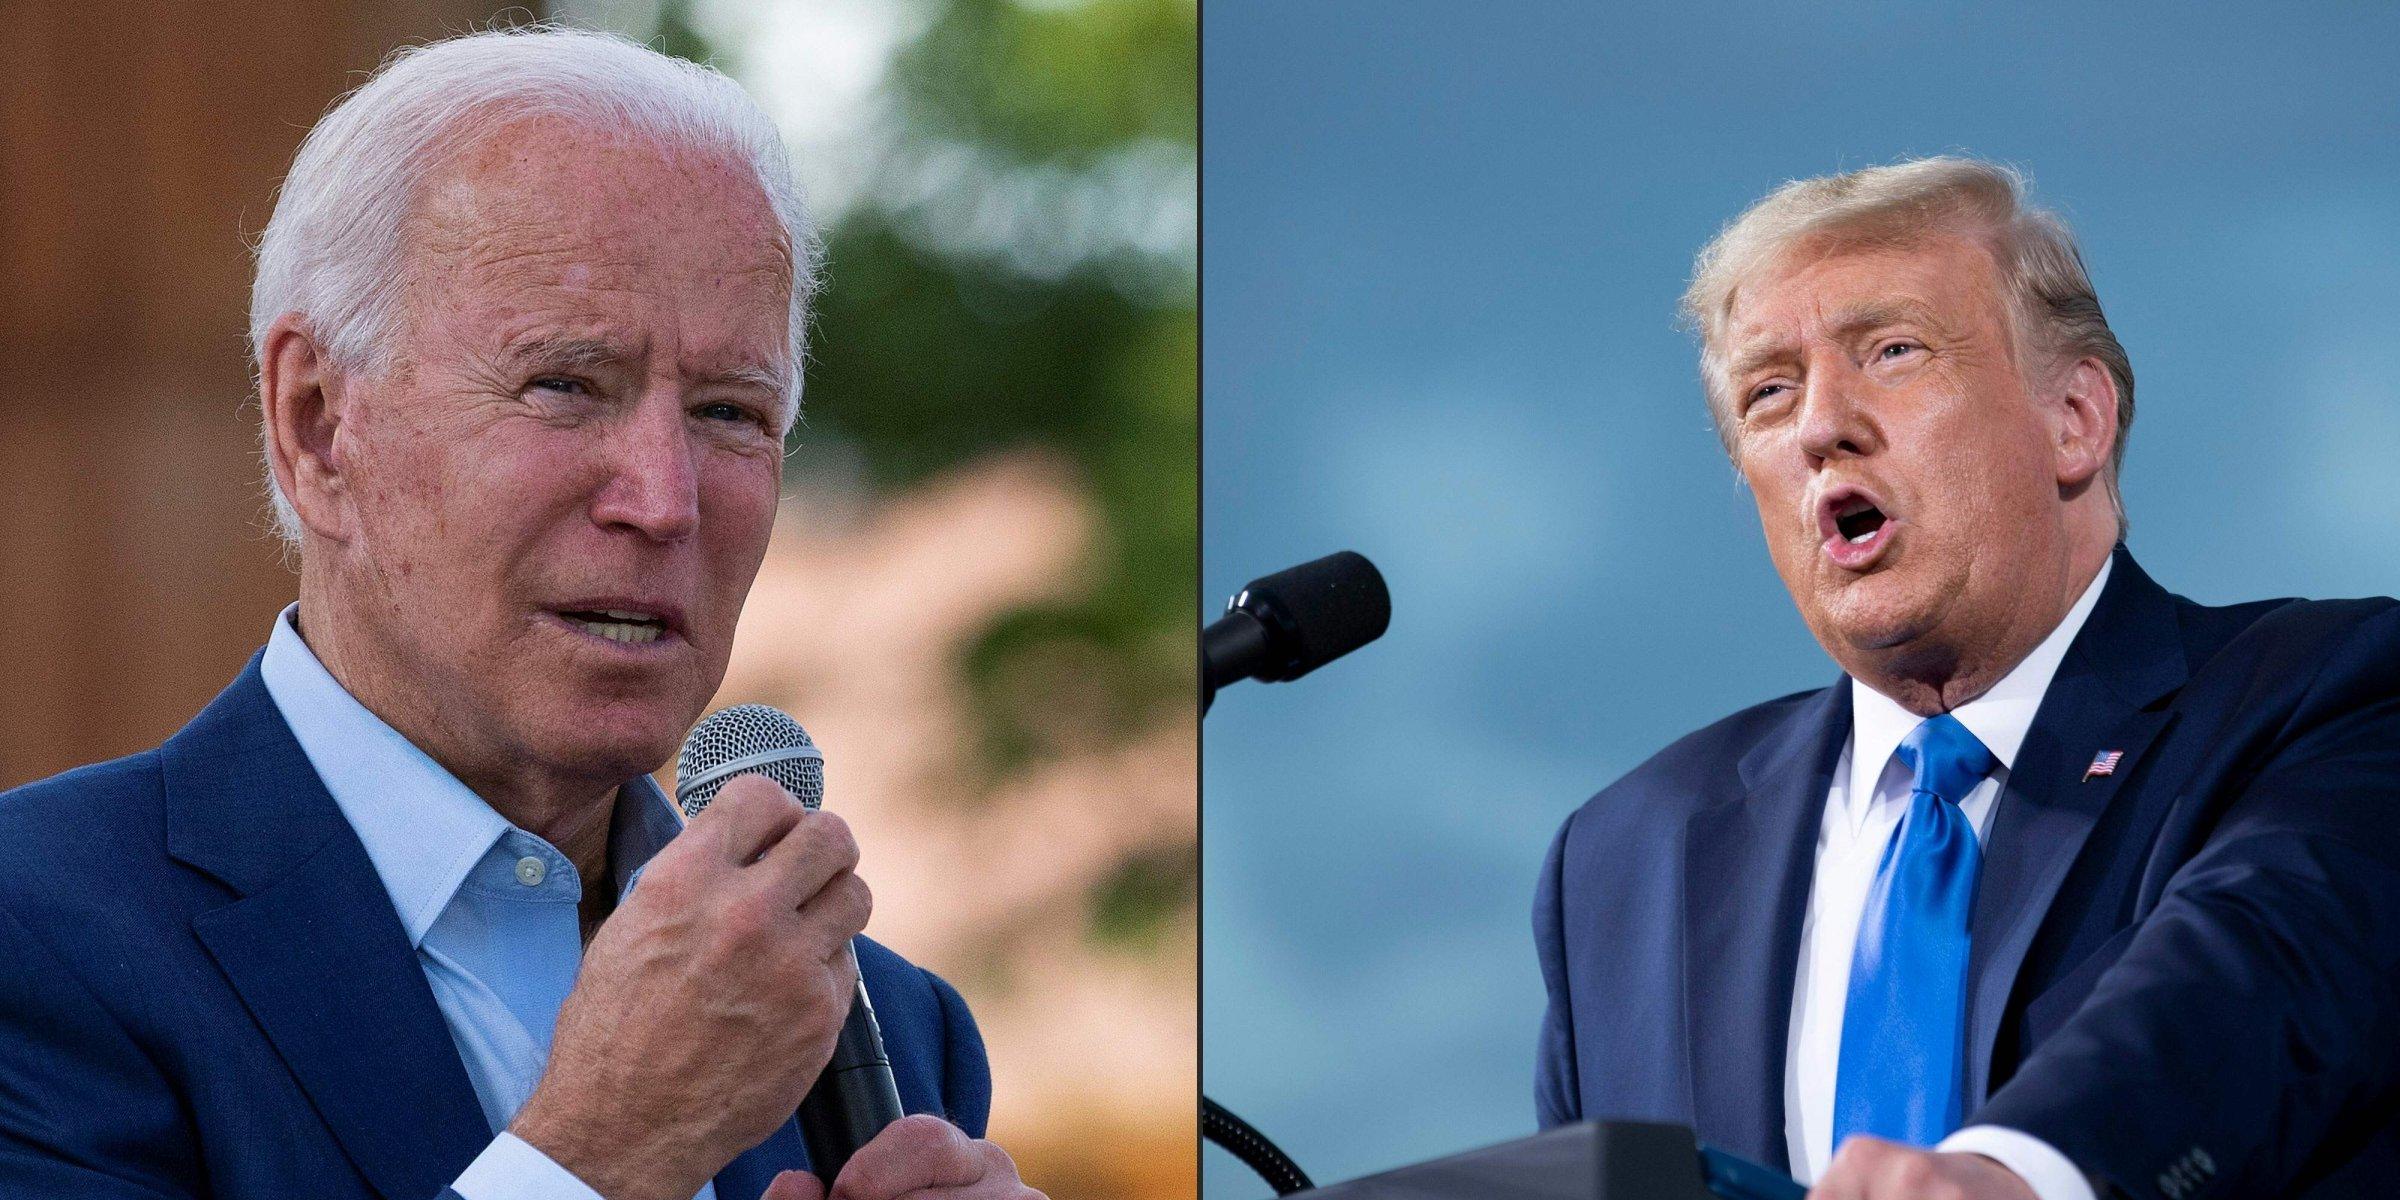 Why I will not vote for Joe Biden